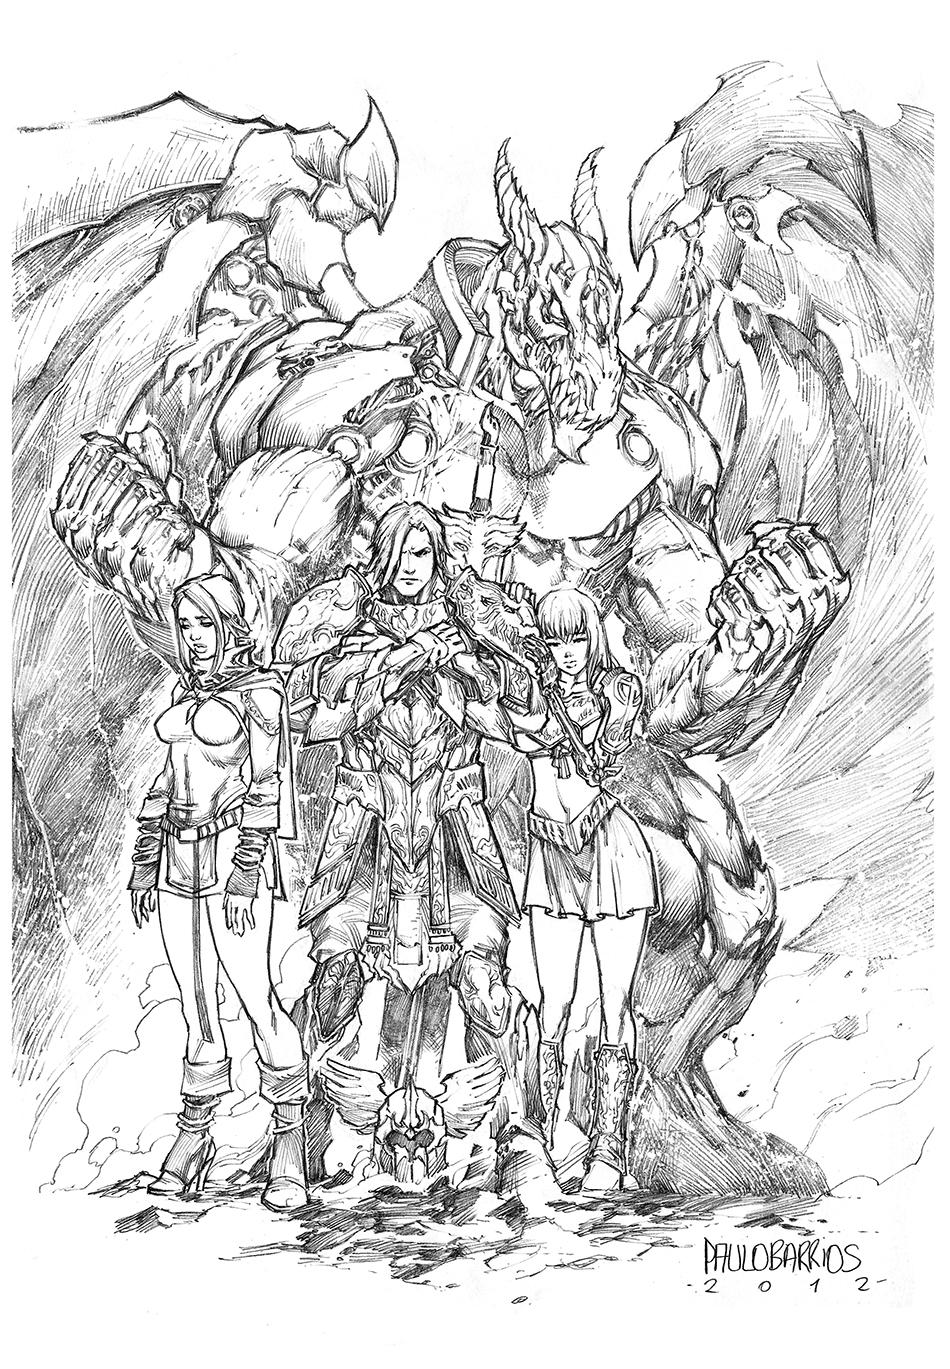 Heroic fantasy by paulobarrios